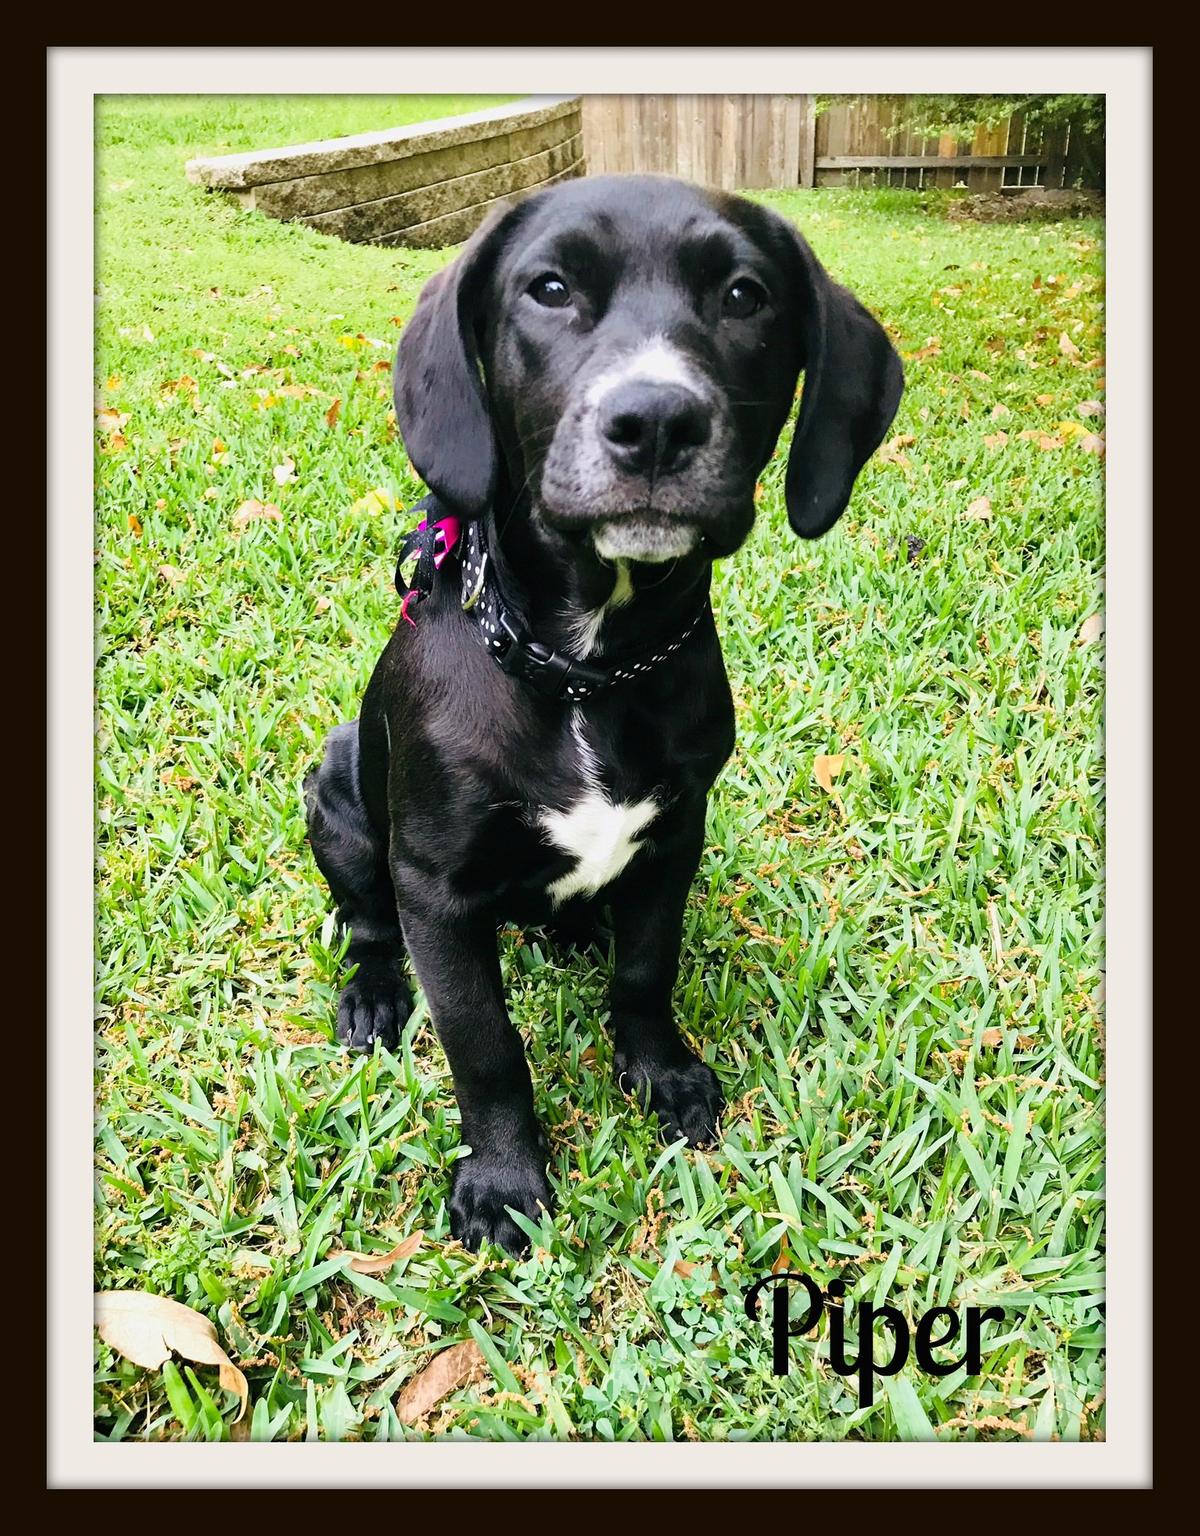 Piper-cvr.jpg